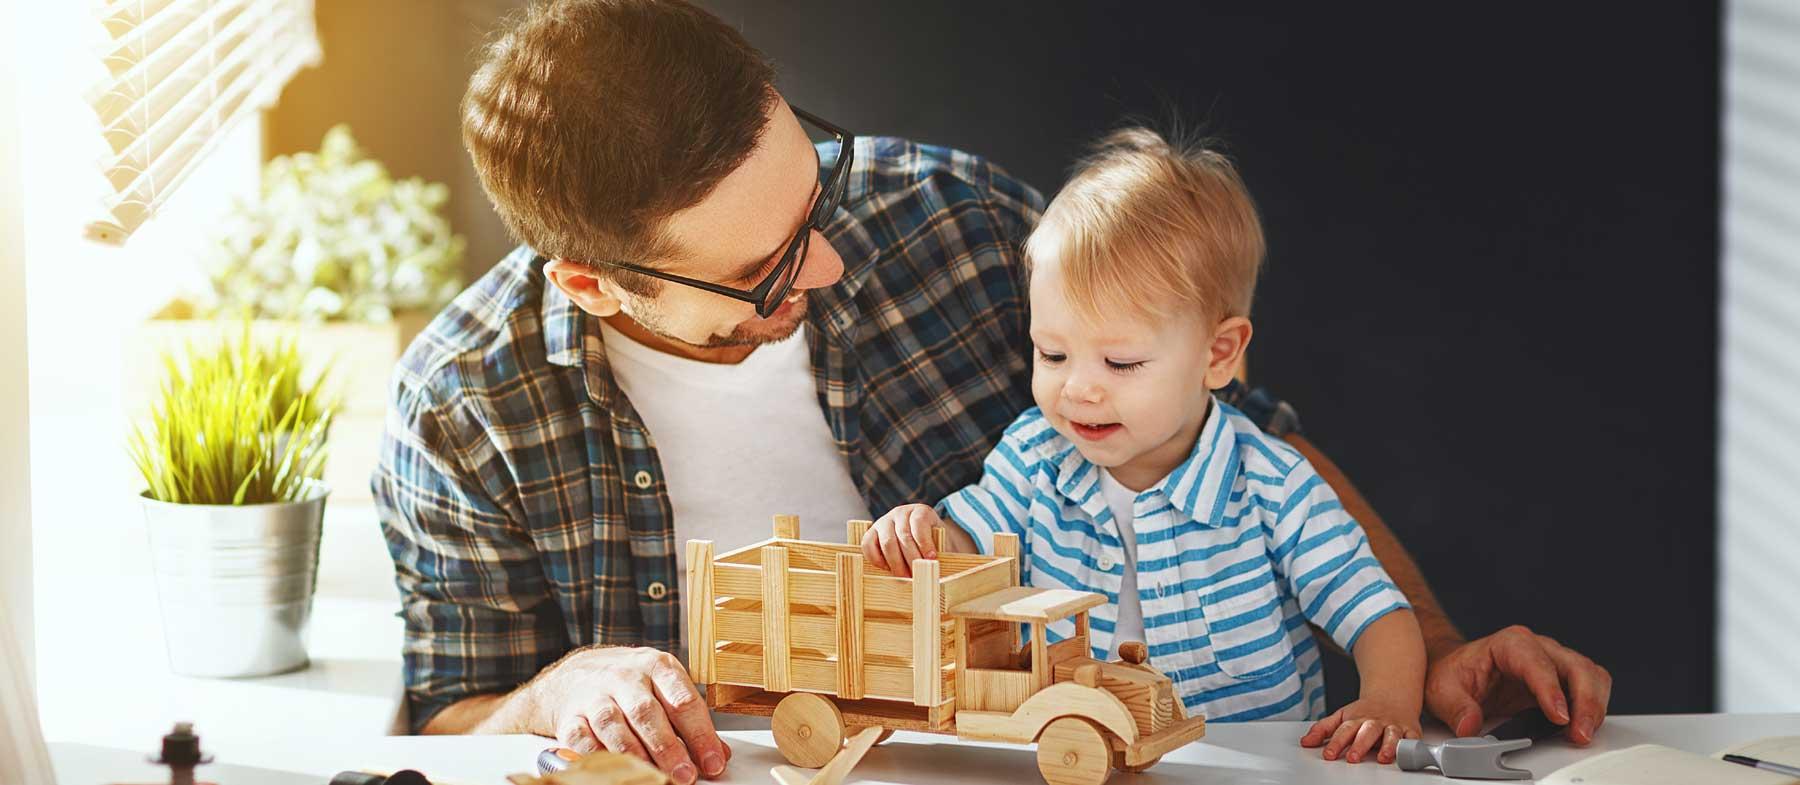 Tiny Tots Speech Pathology Adelaide therapy children communication feeding skills